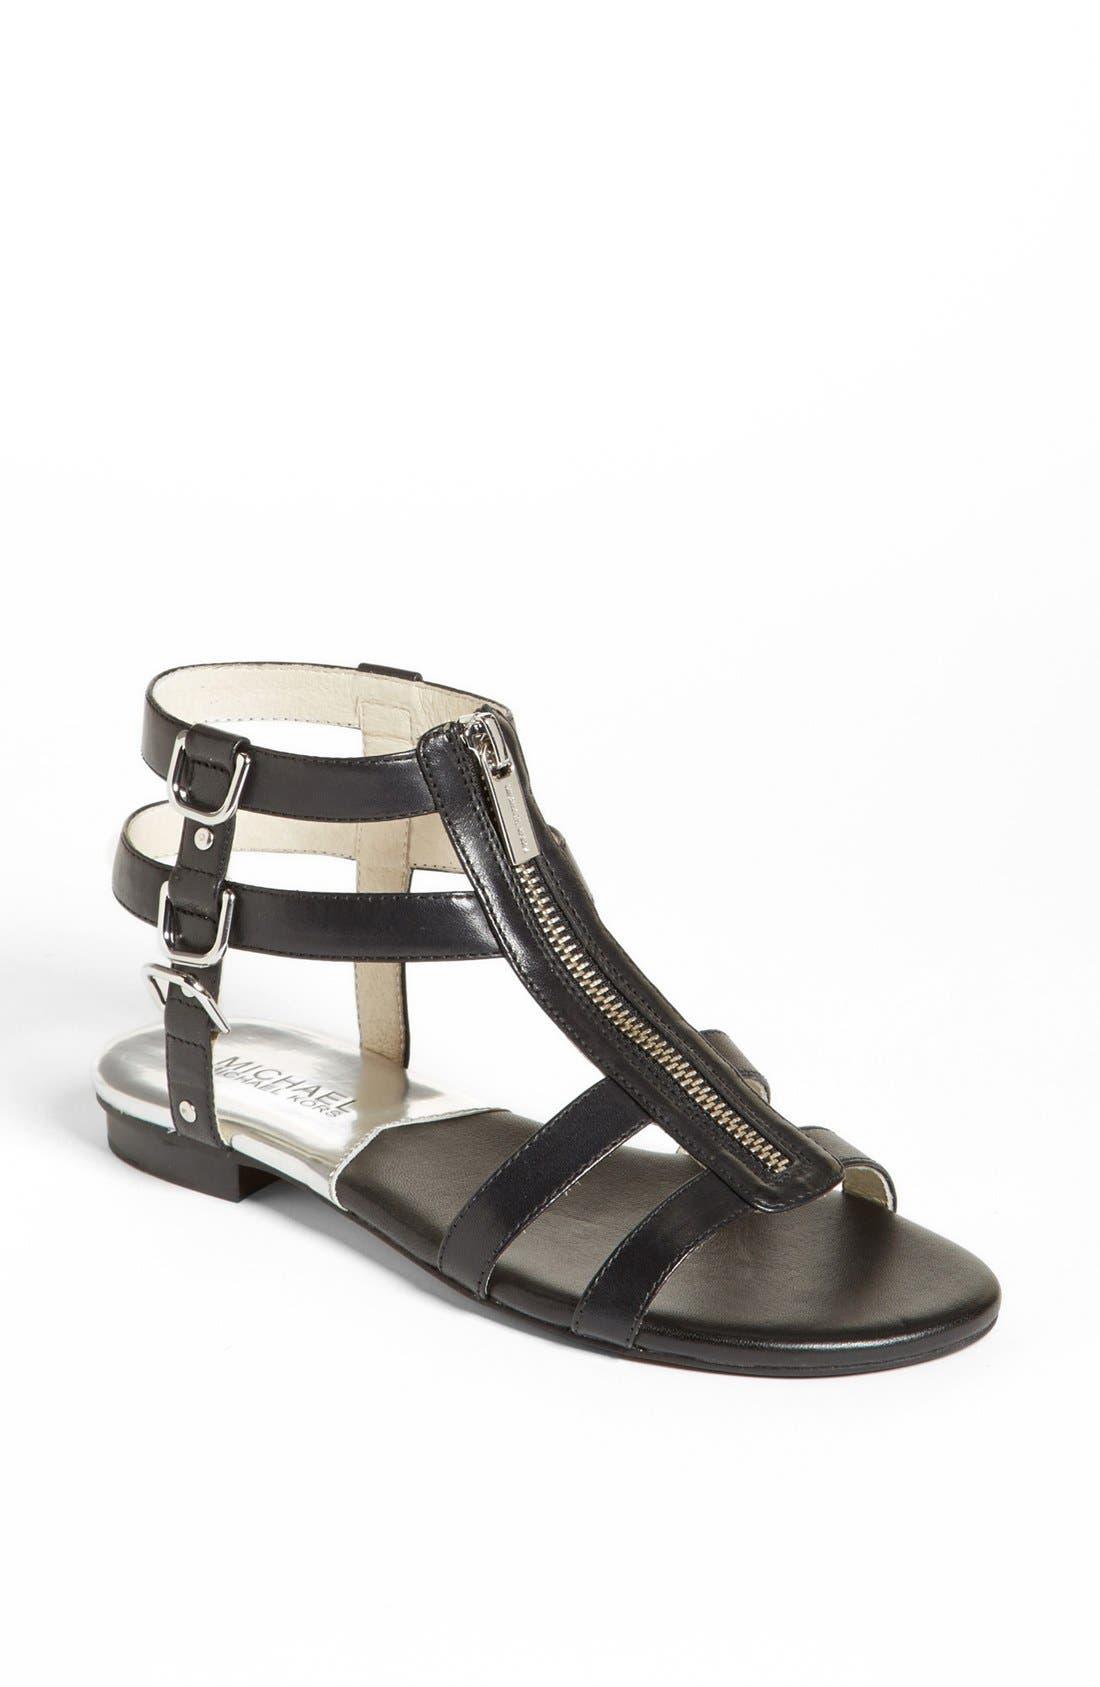 Main Image - MICHAEL Michael Kors 'Kennedy' Flat Leather Gladiator Sandal